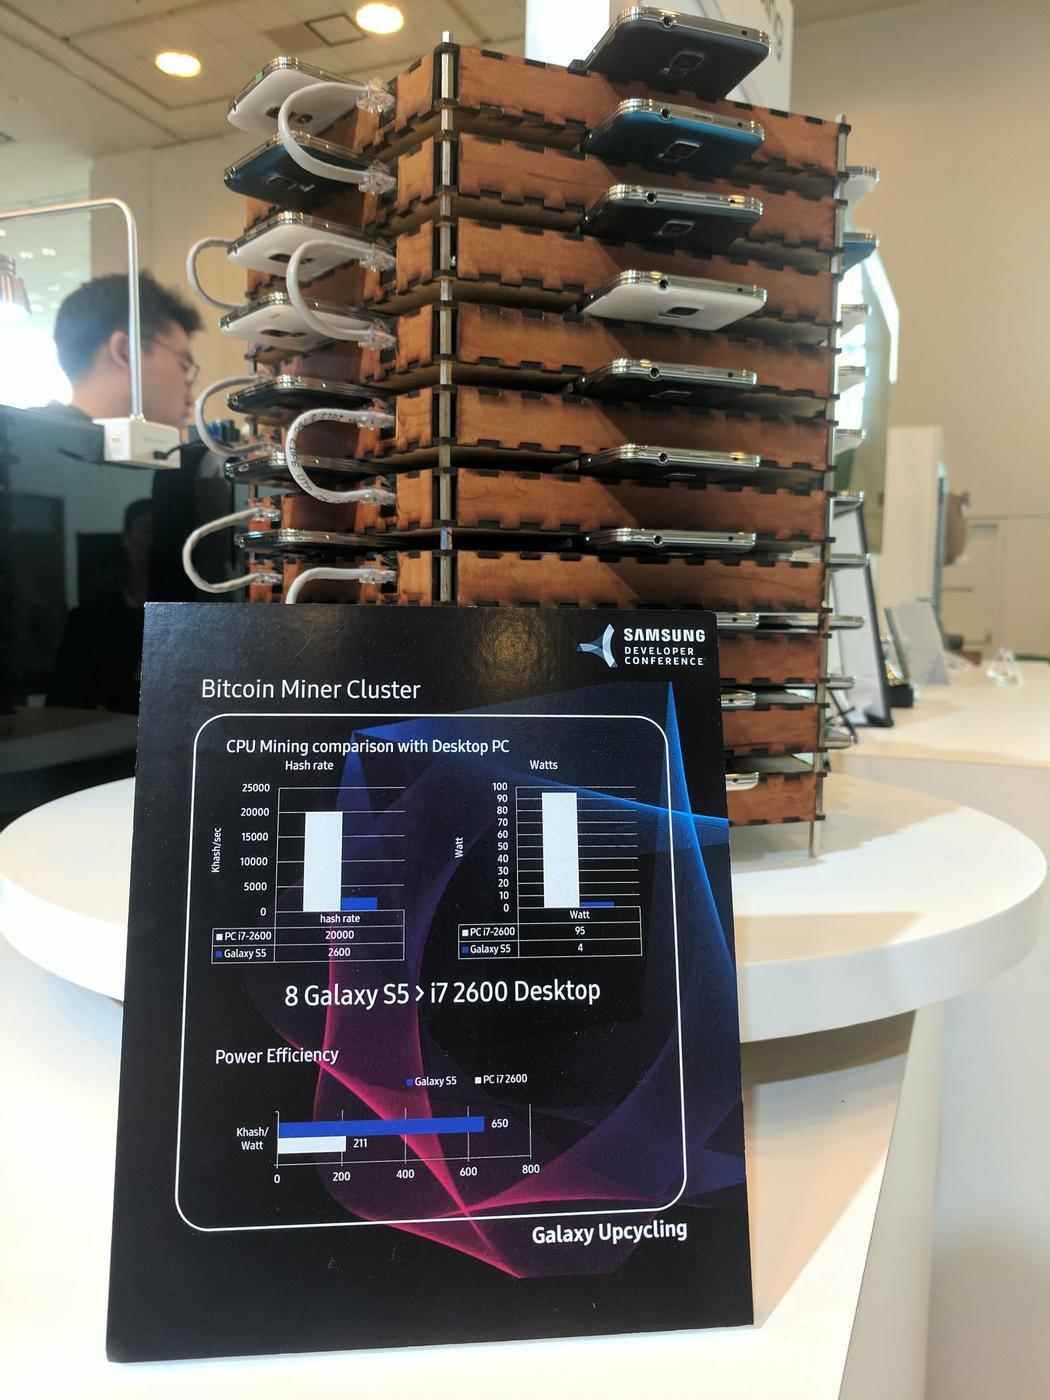 samsung-galaxy-s5-bitcoin-miner-cluster